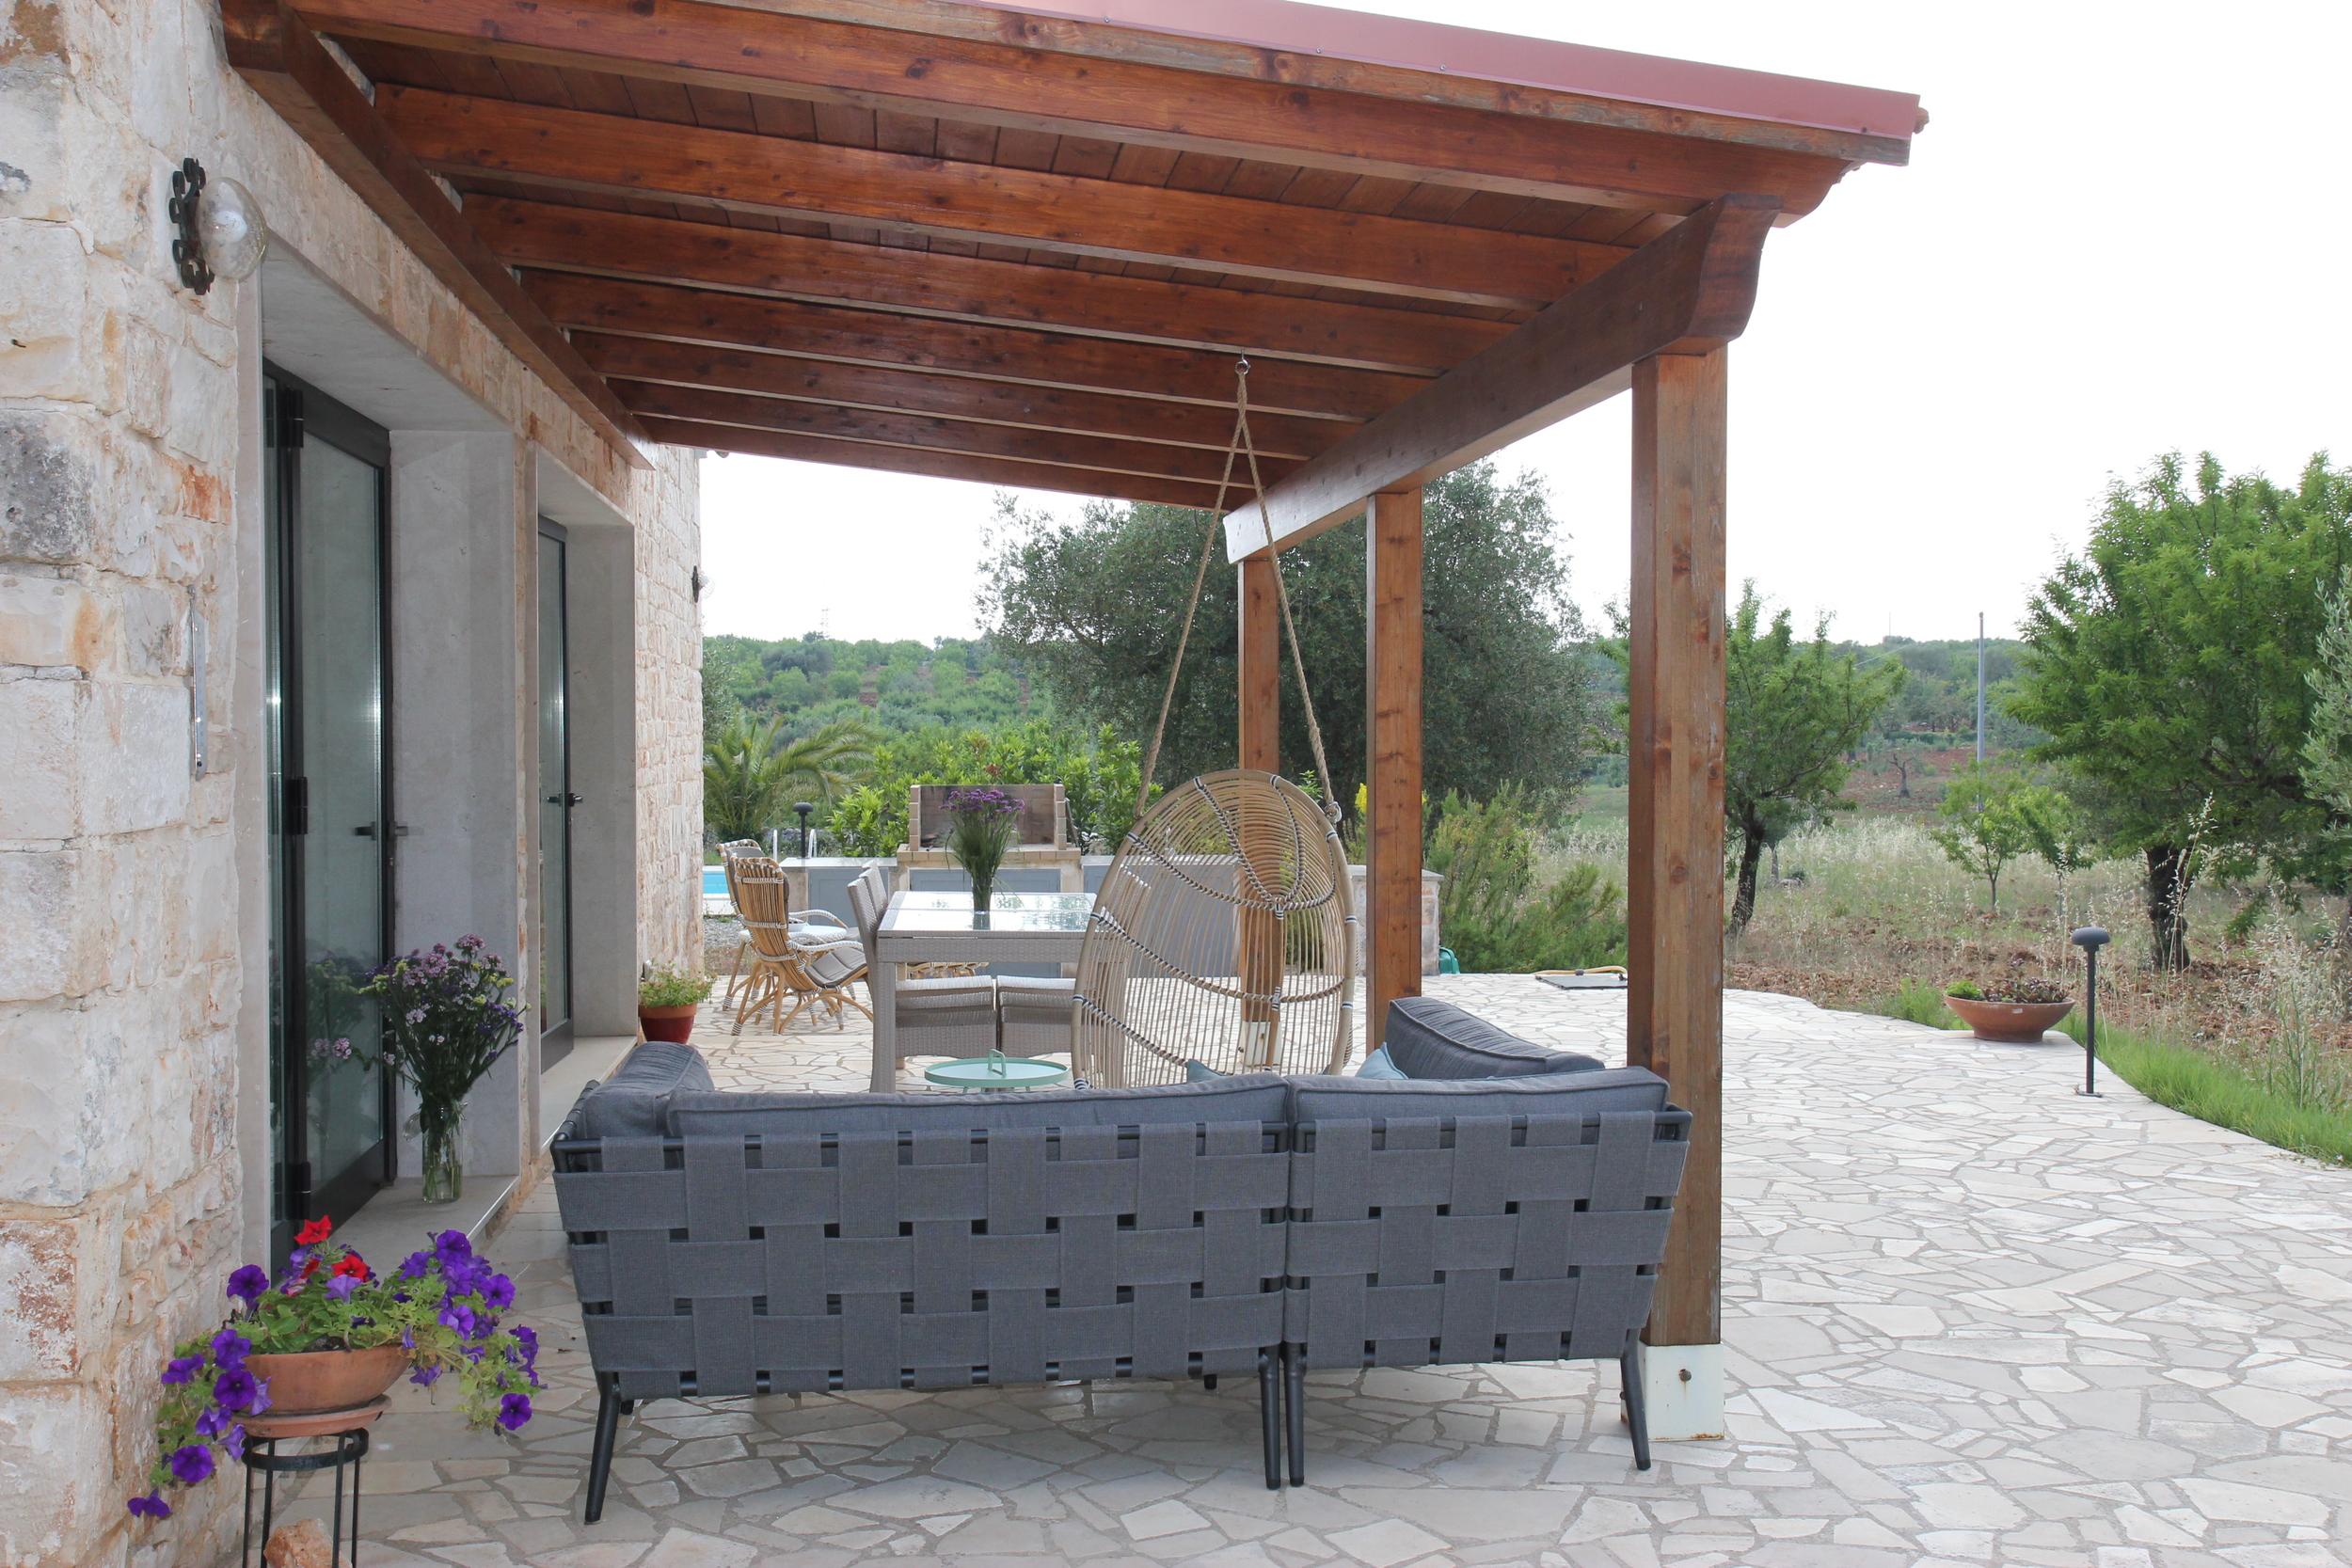 Puglia 2015-06 267.JPG